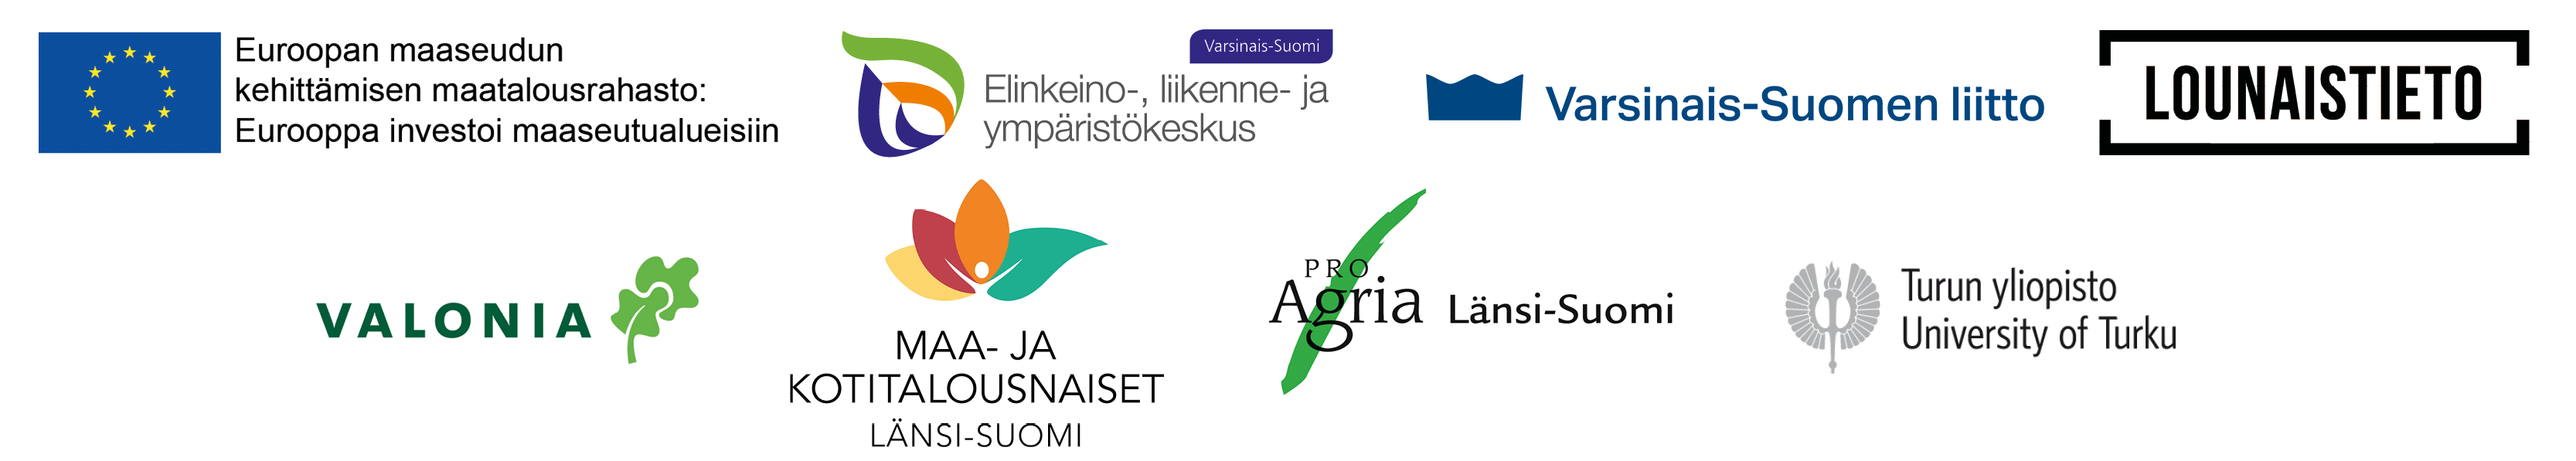 Digi-SAAPAS -hankkeen partnerien logot